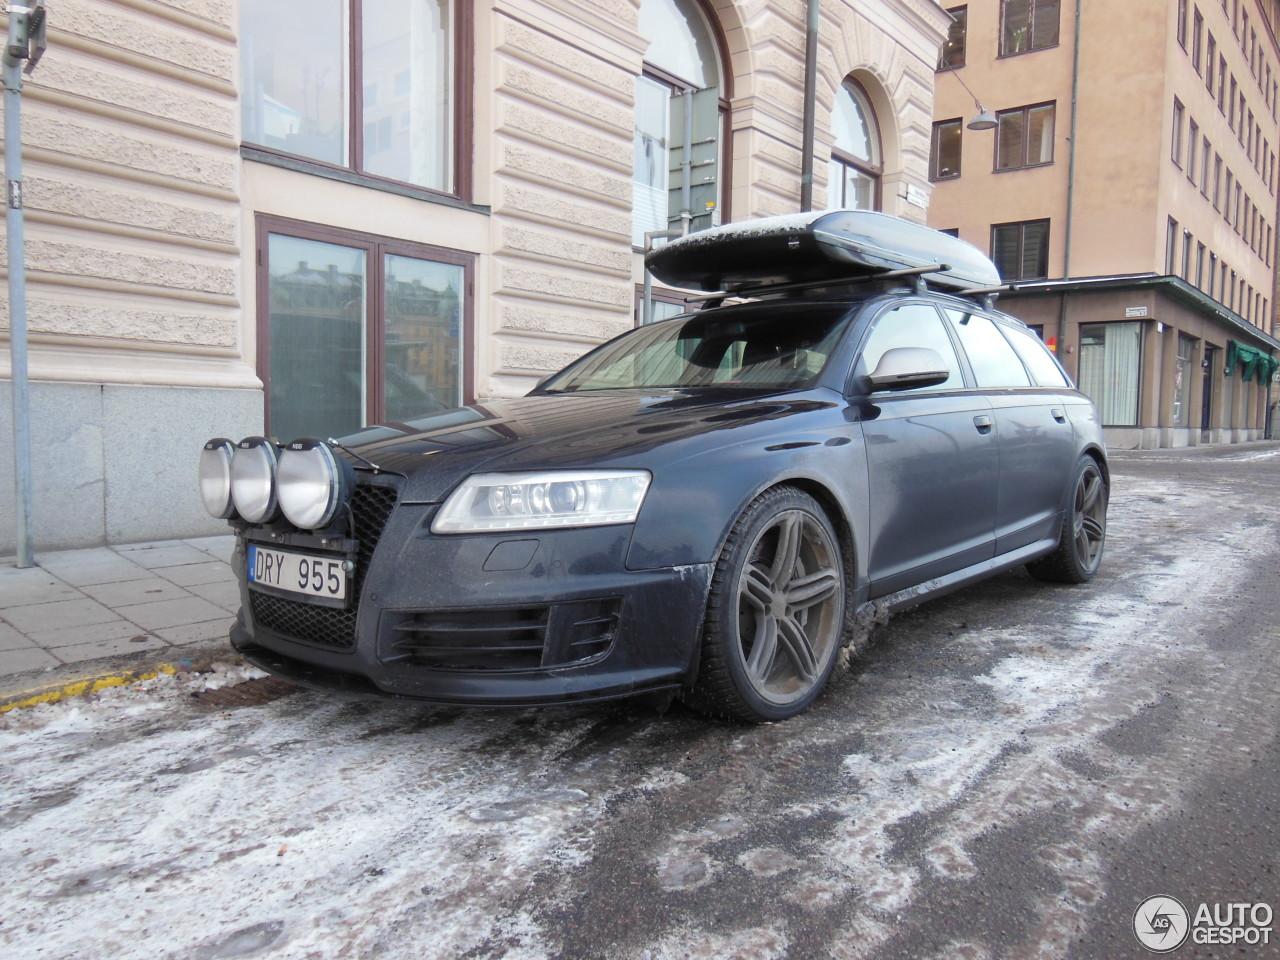 Audi RS6 Avant C6 - 19 January 2014 - Autogespot